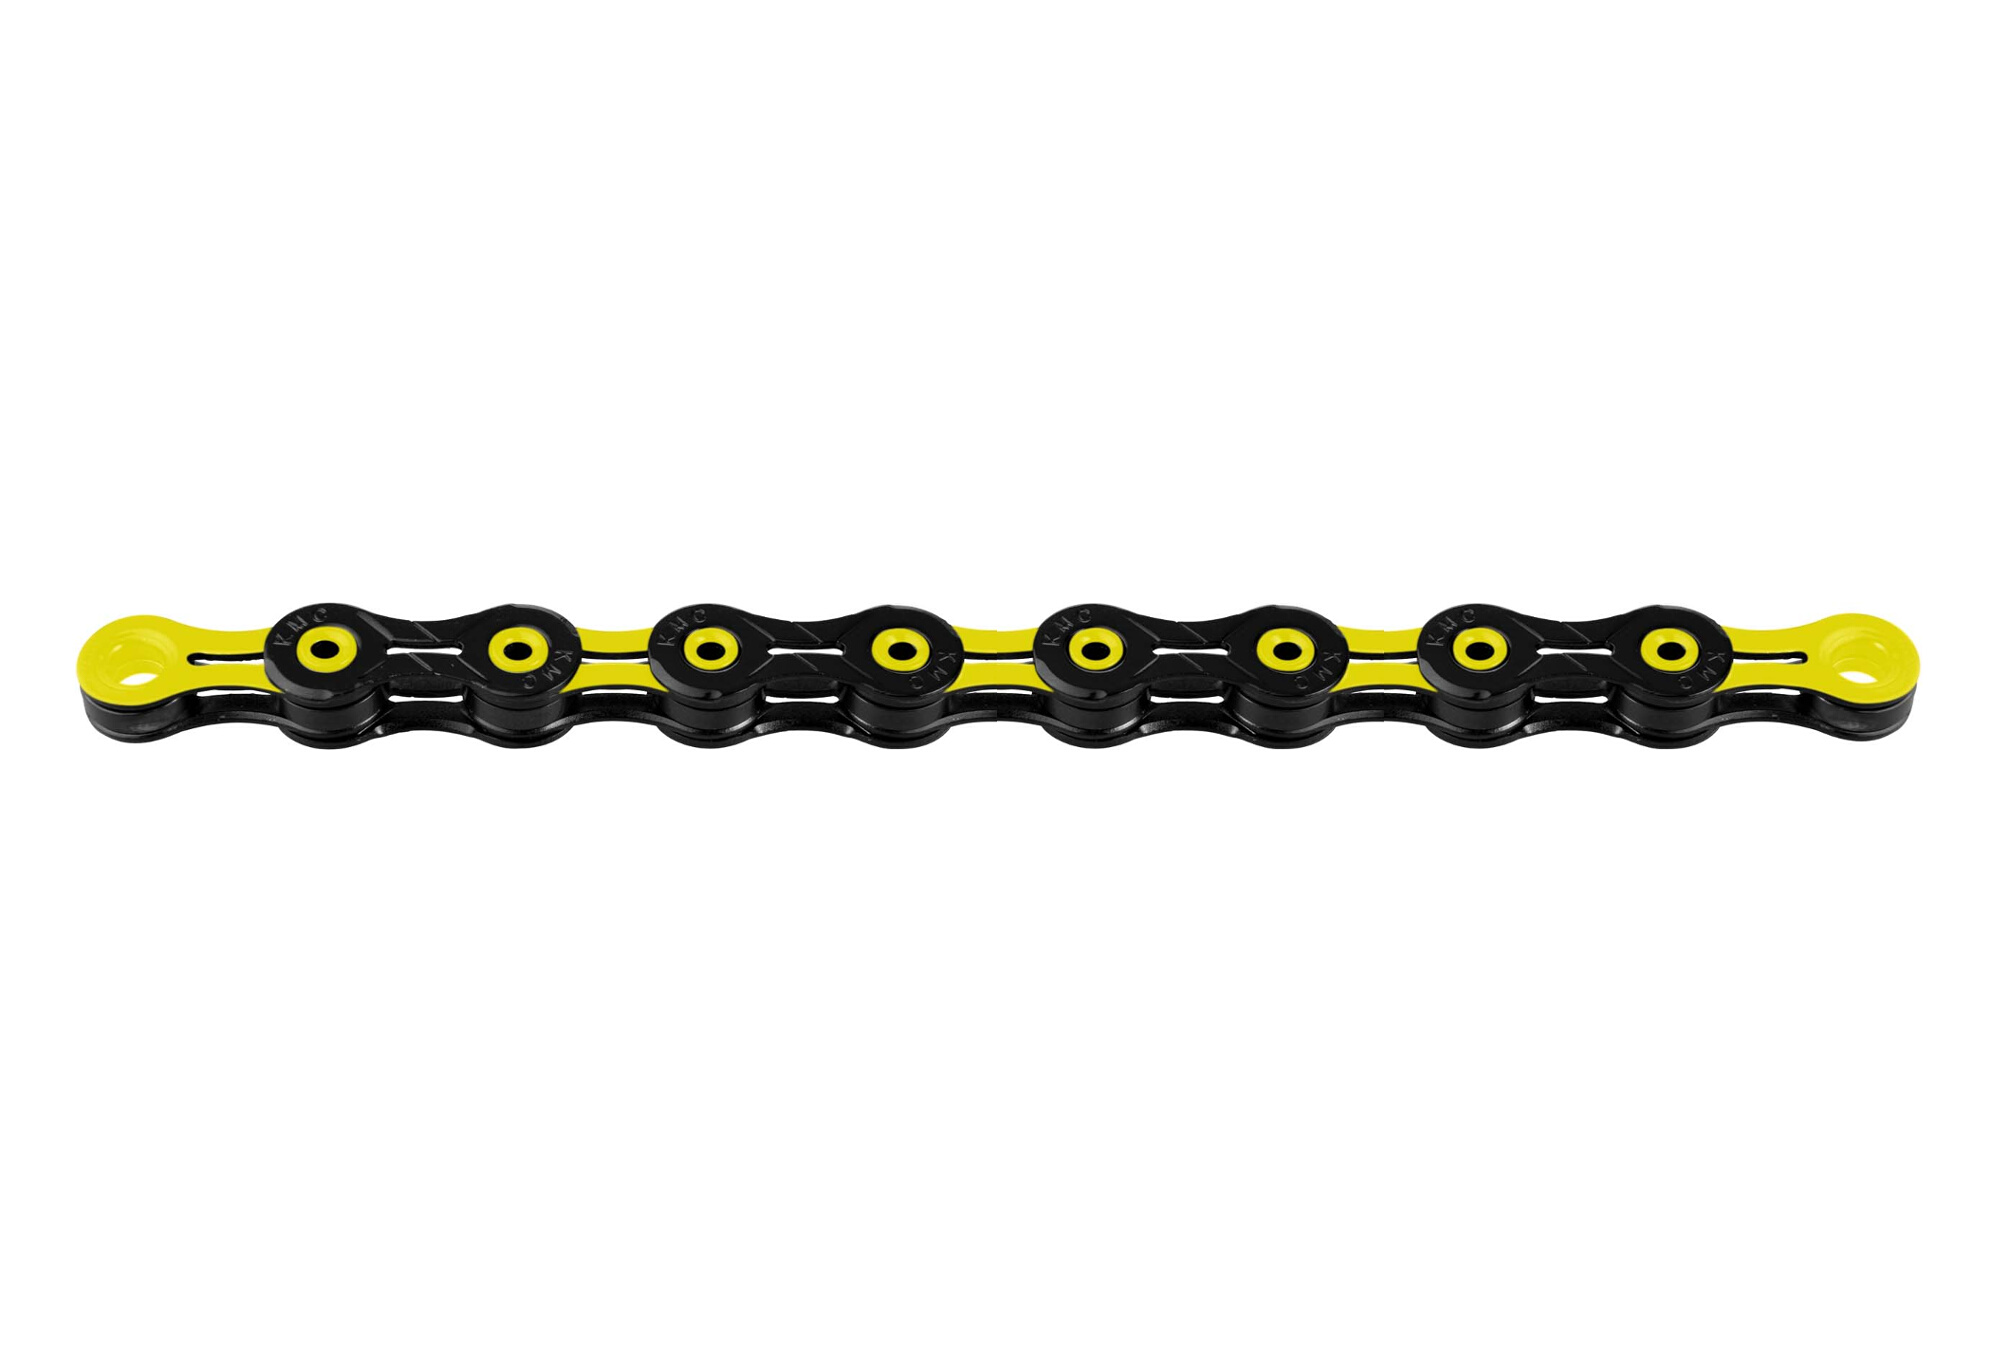 quality design 8d580 8d847 KMC DLC11 Chain 116 Links 11s Black Yellow